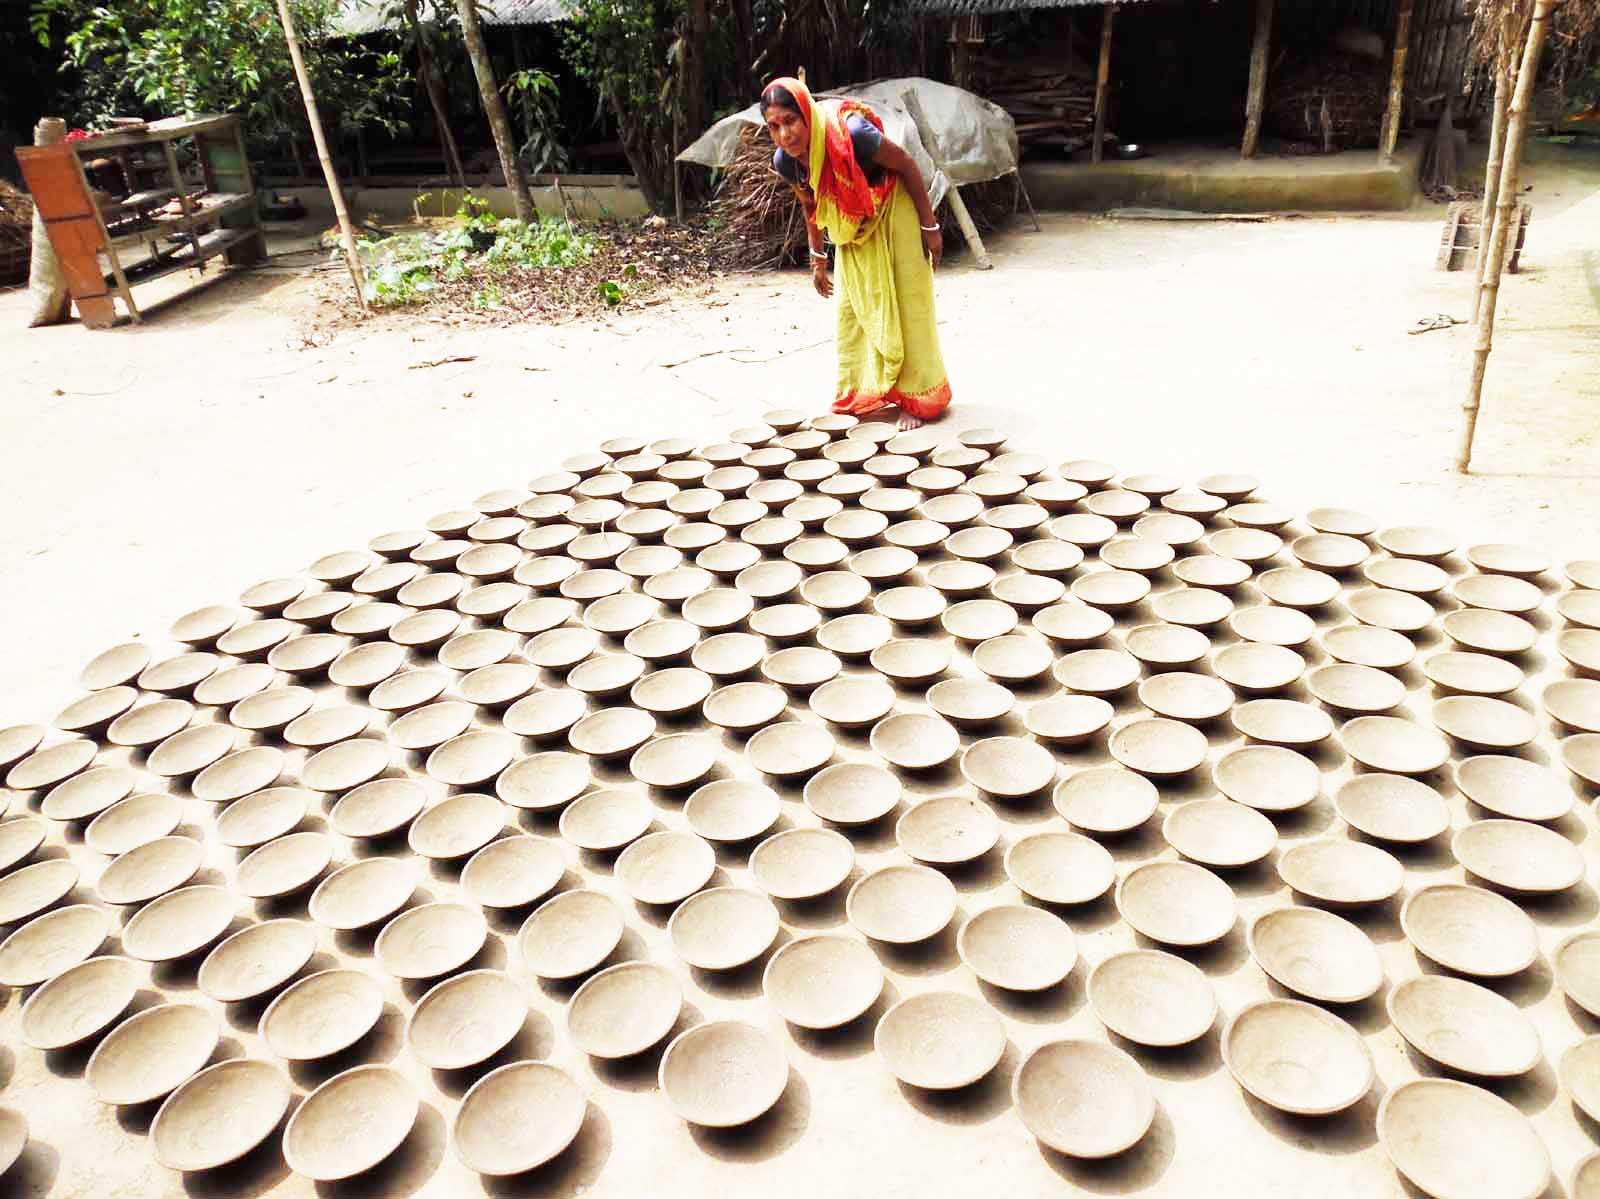 Pottery, Mina Rani Pul, Chalitatala W.S. Narail Sadar, Narail